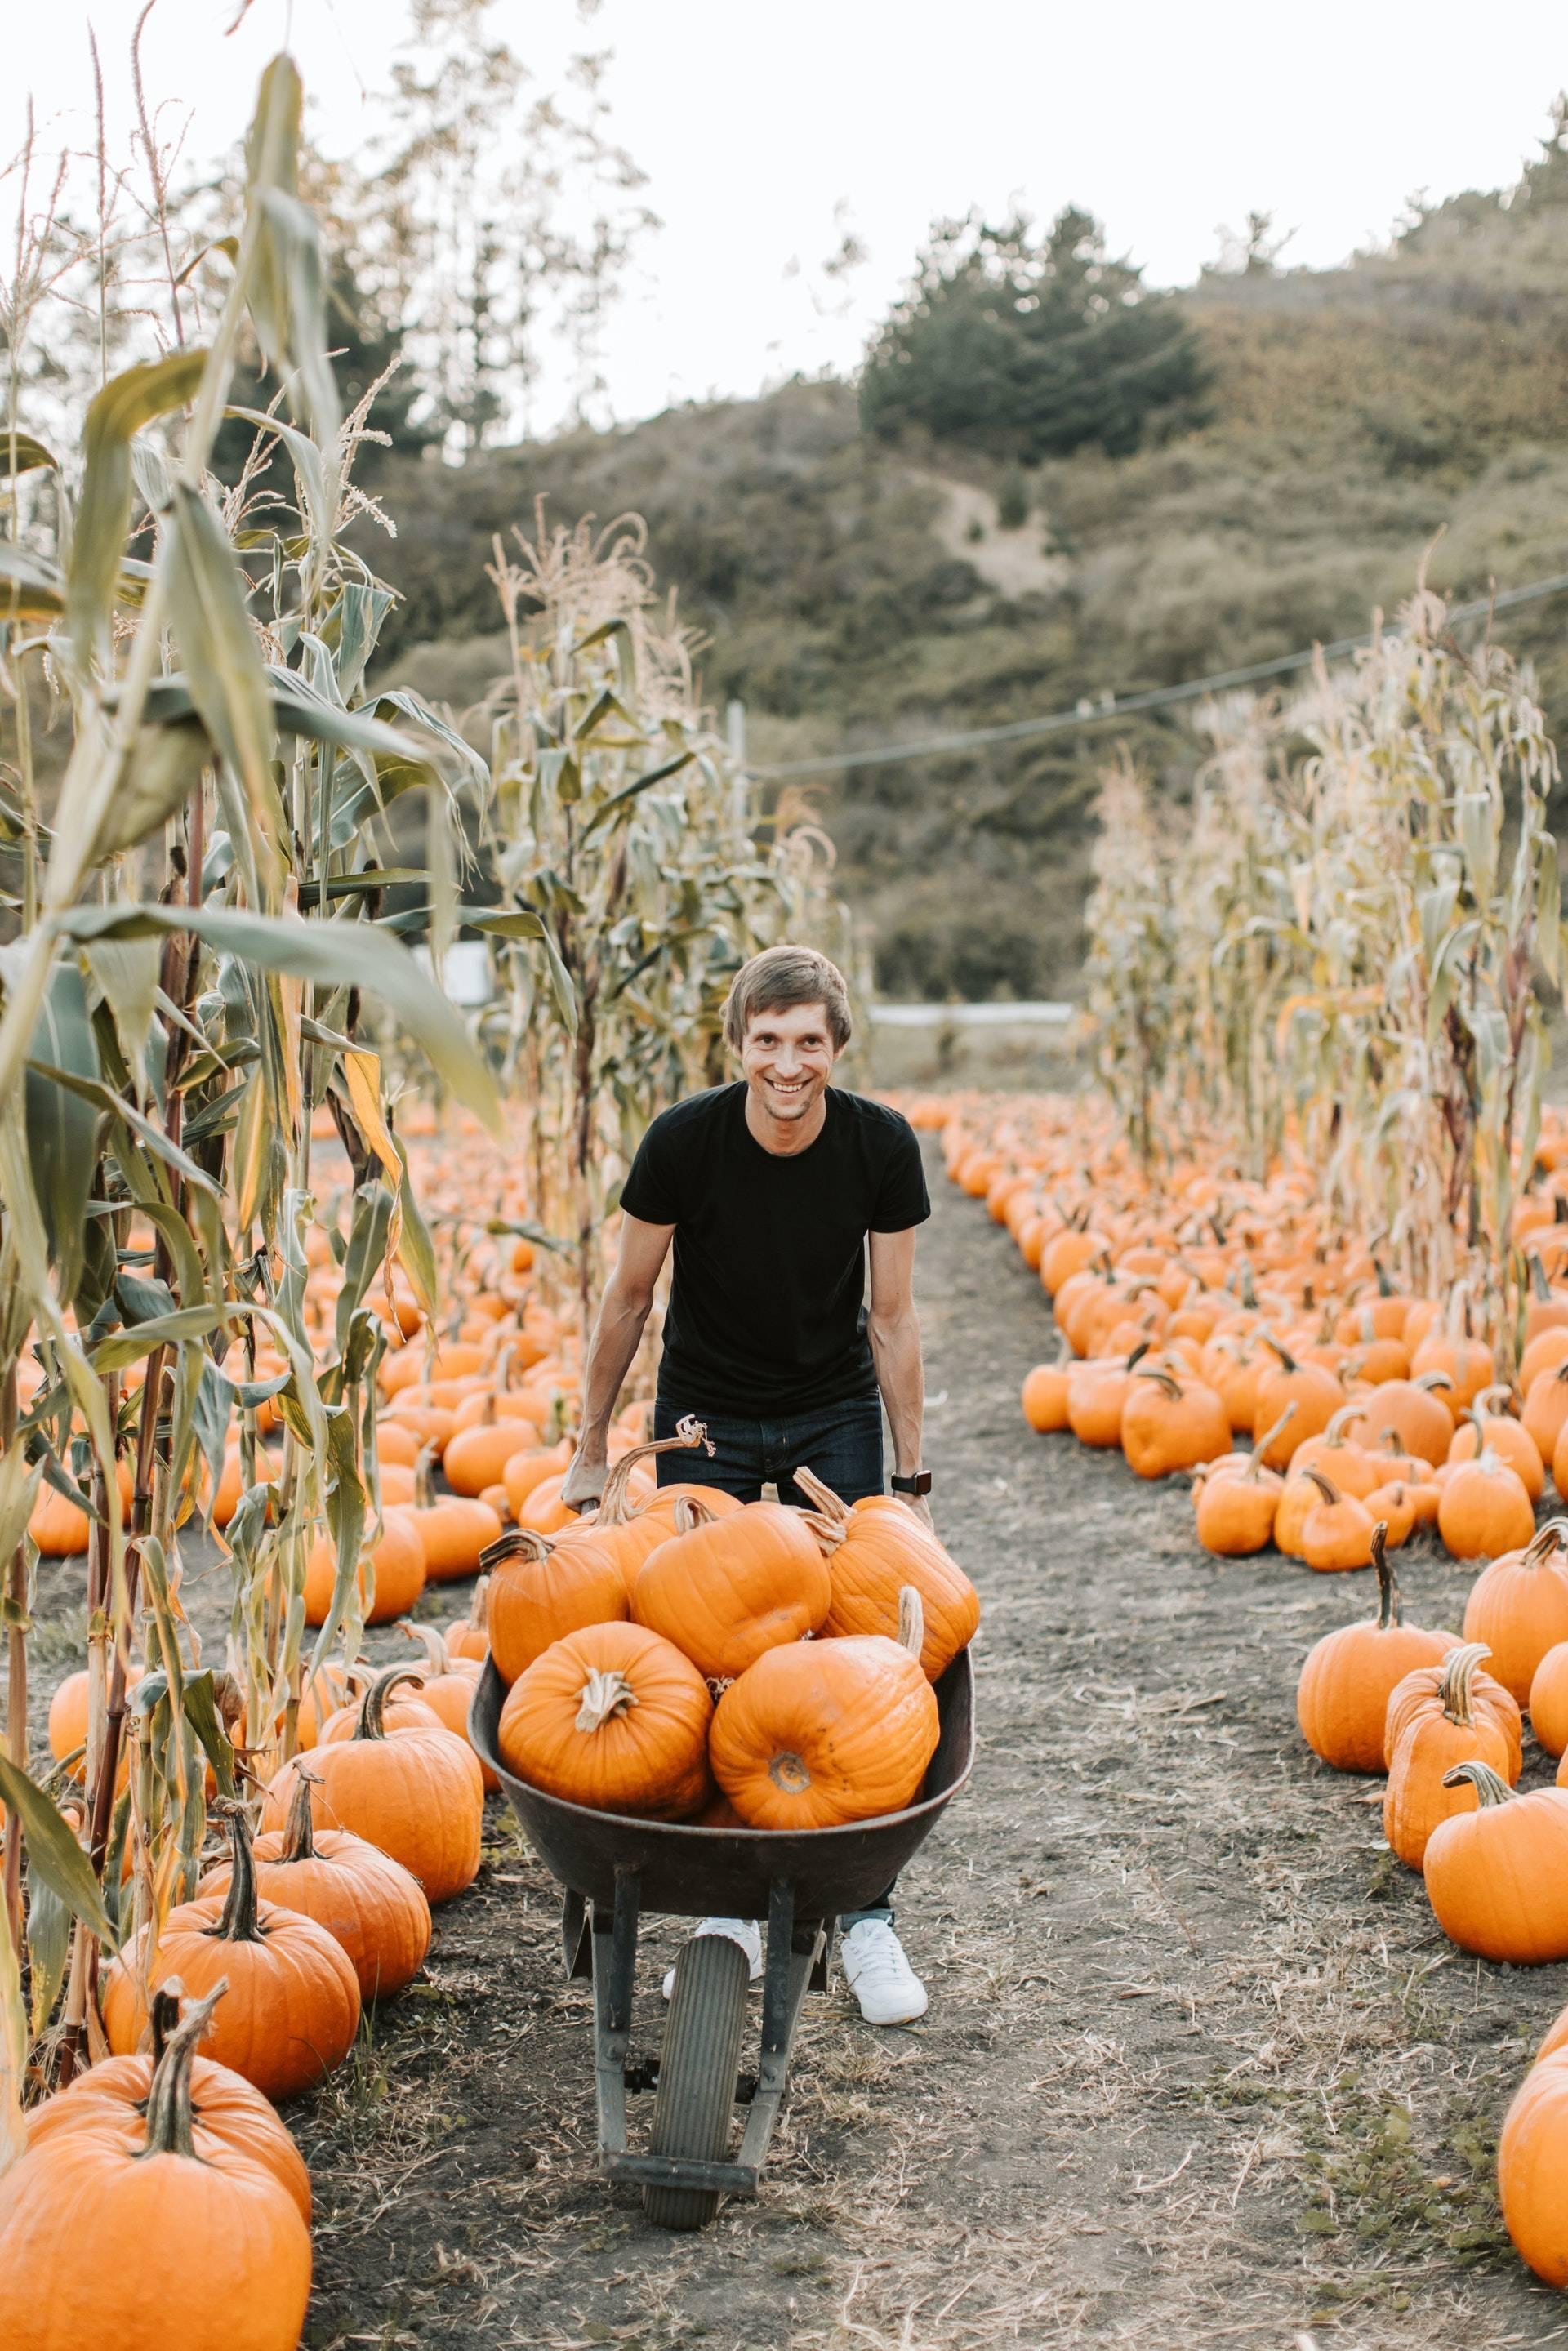 Have a Spooky Halloween in Gatlinburg